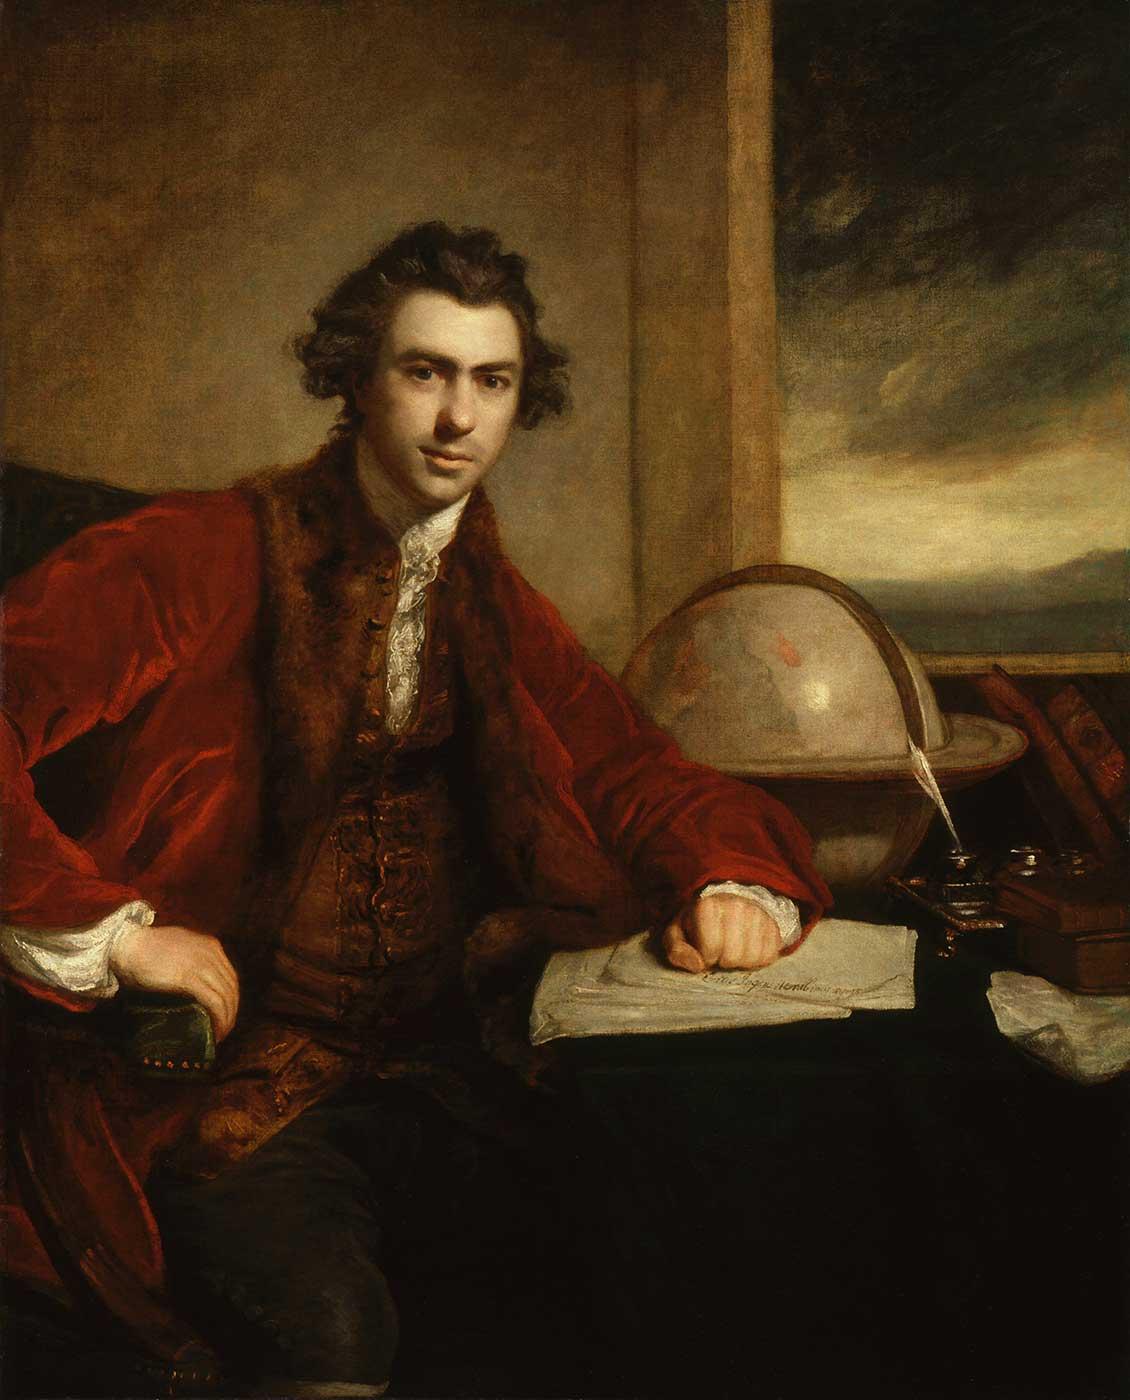 Sir Joseph Banks - click to view larger image